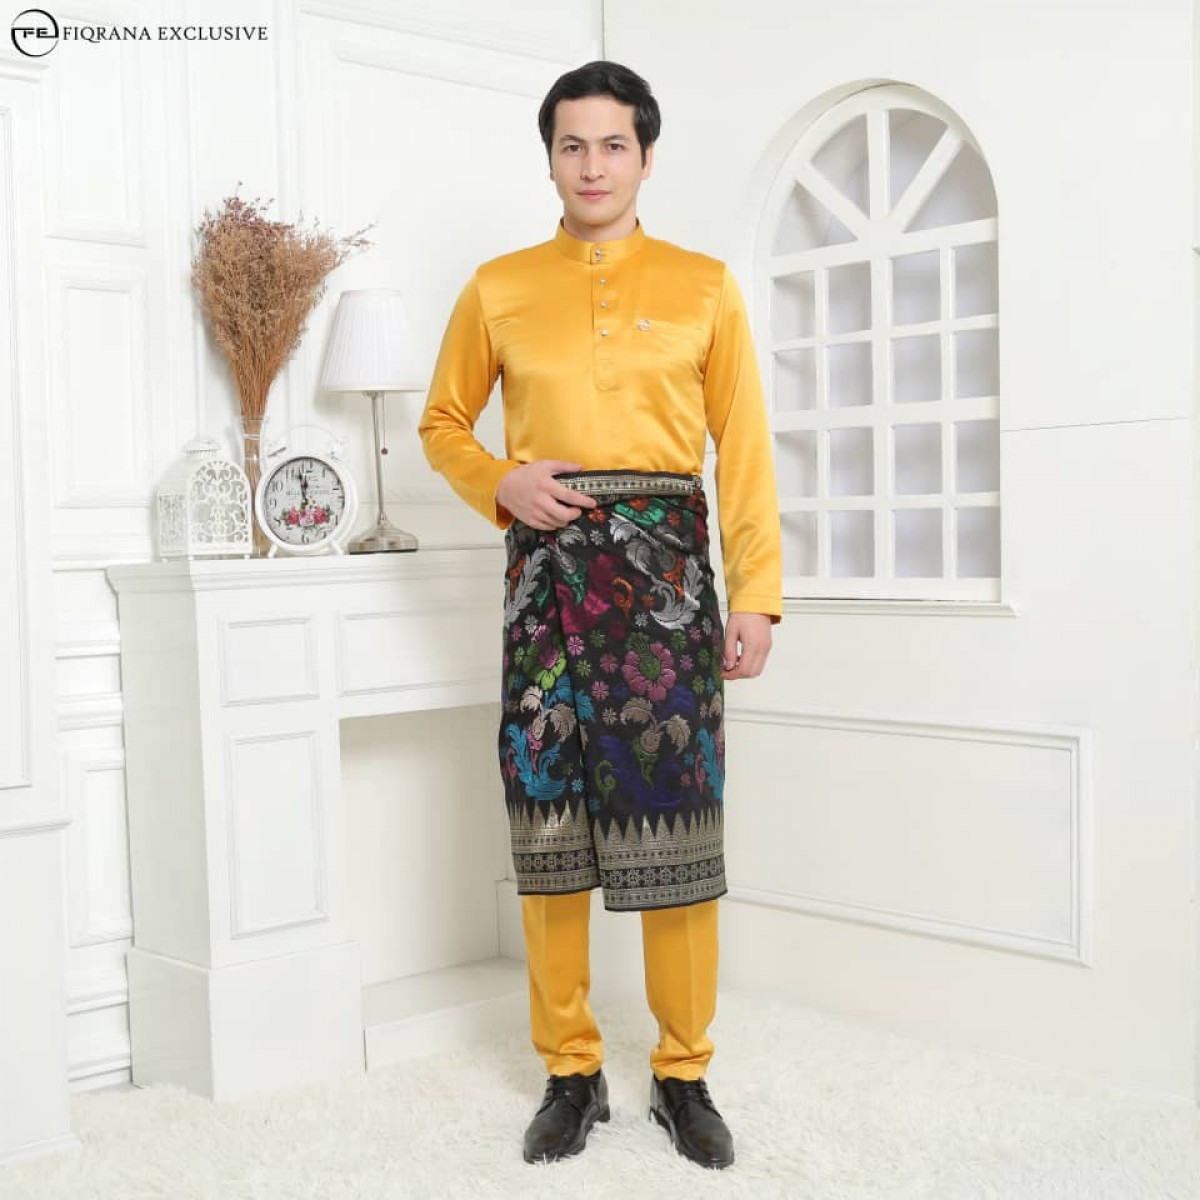 Baju Melayu Slimfit Mustard - Fiqrana Exclusive